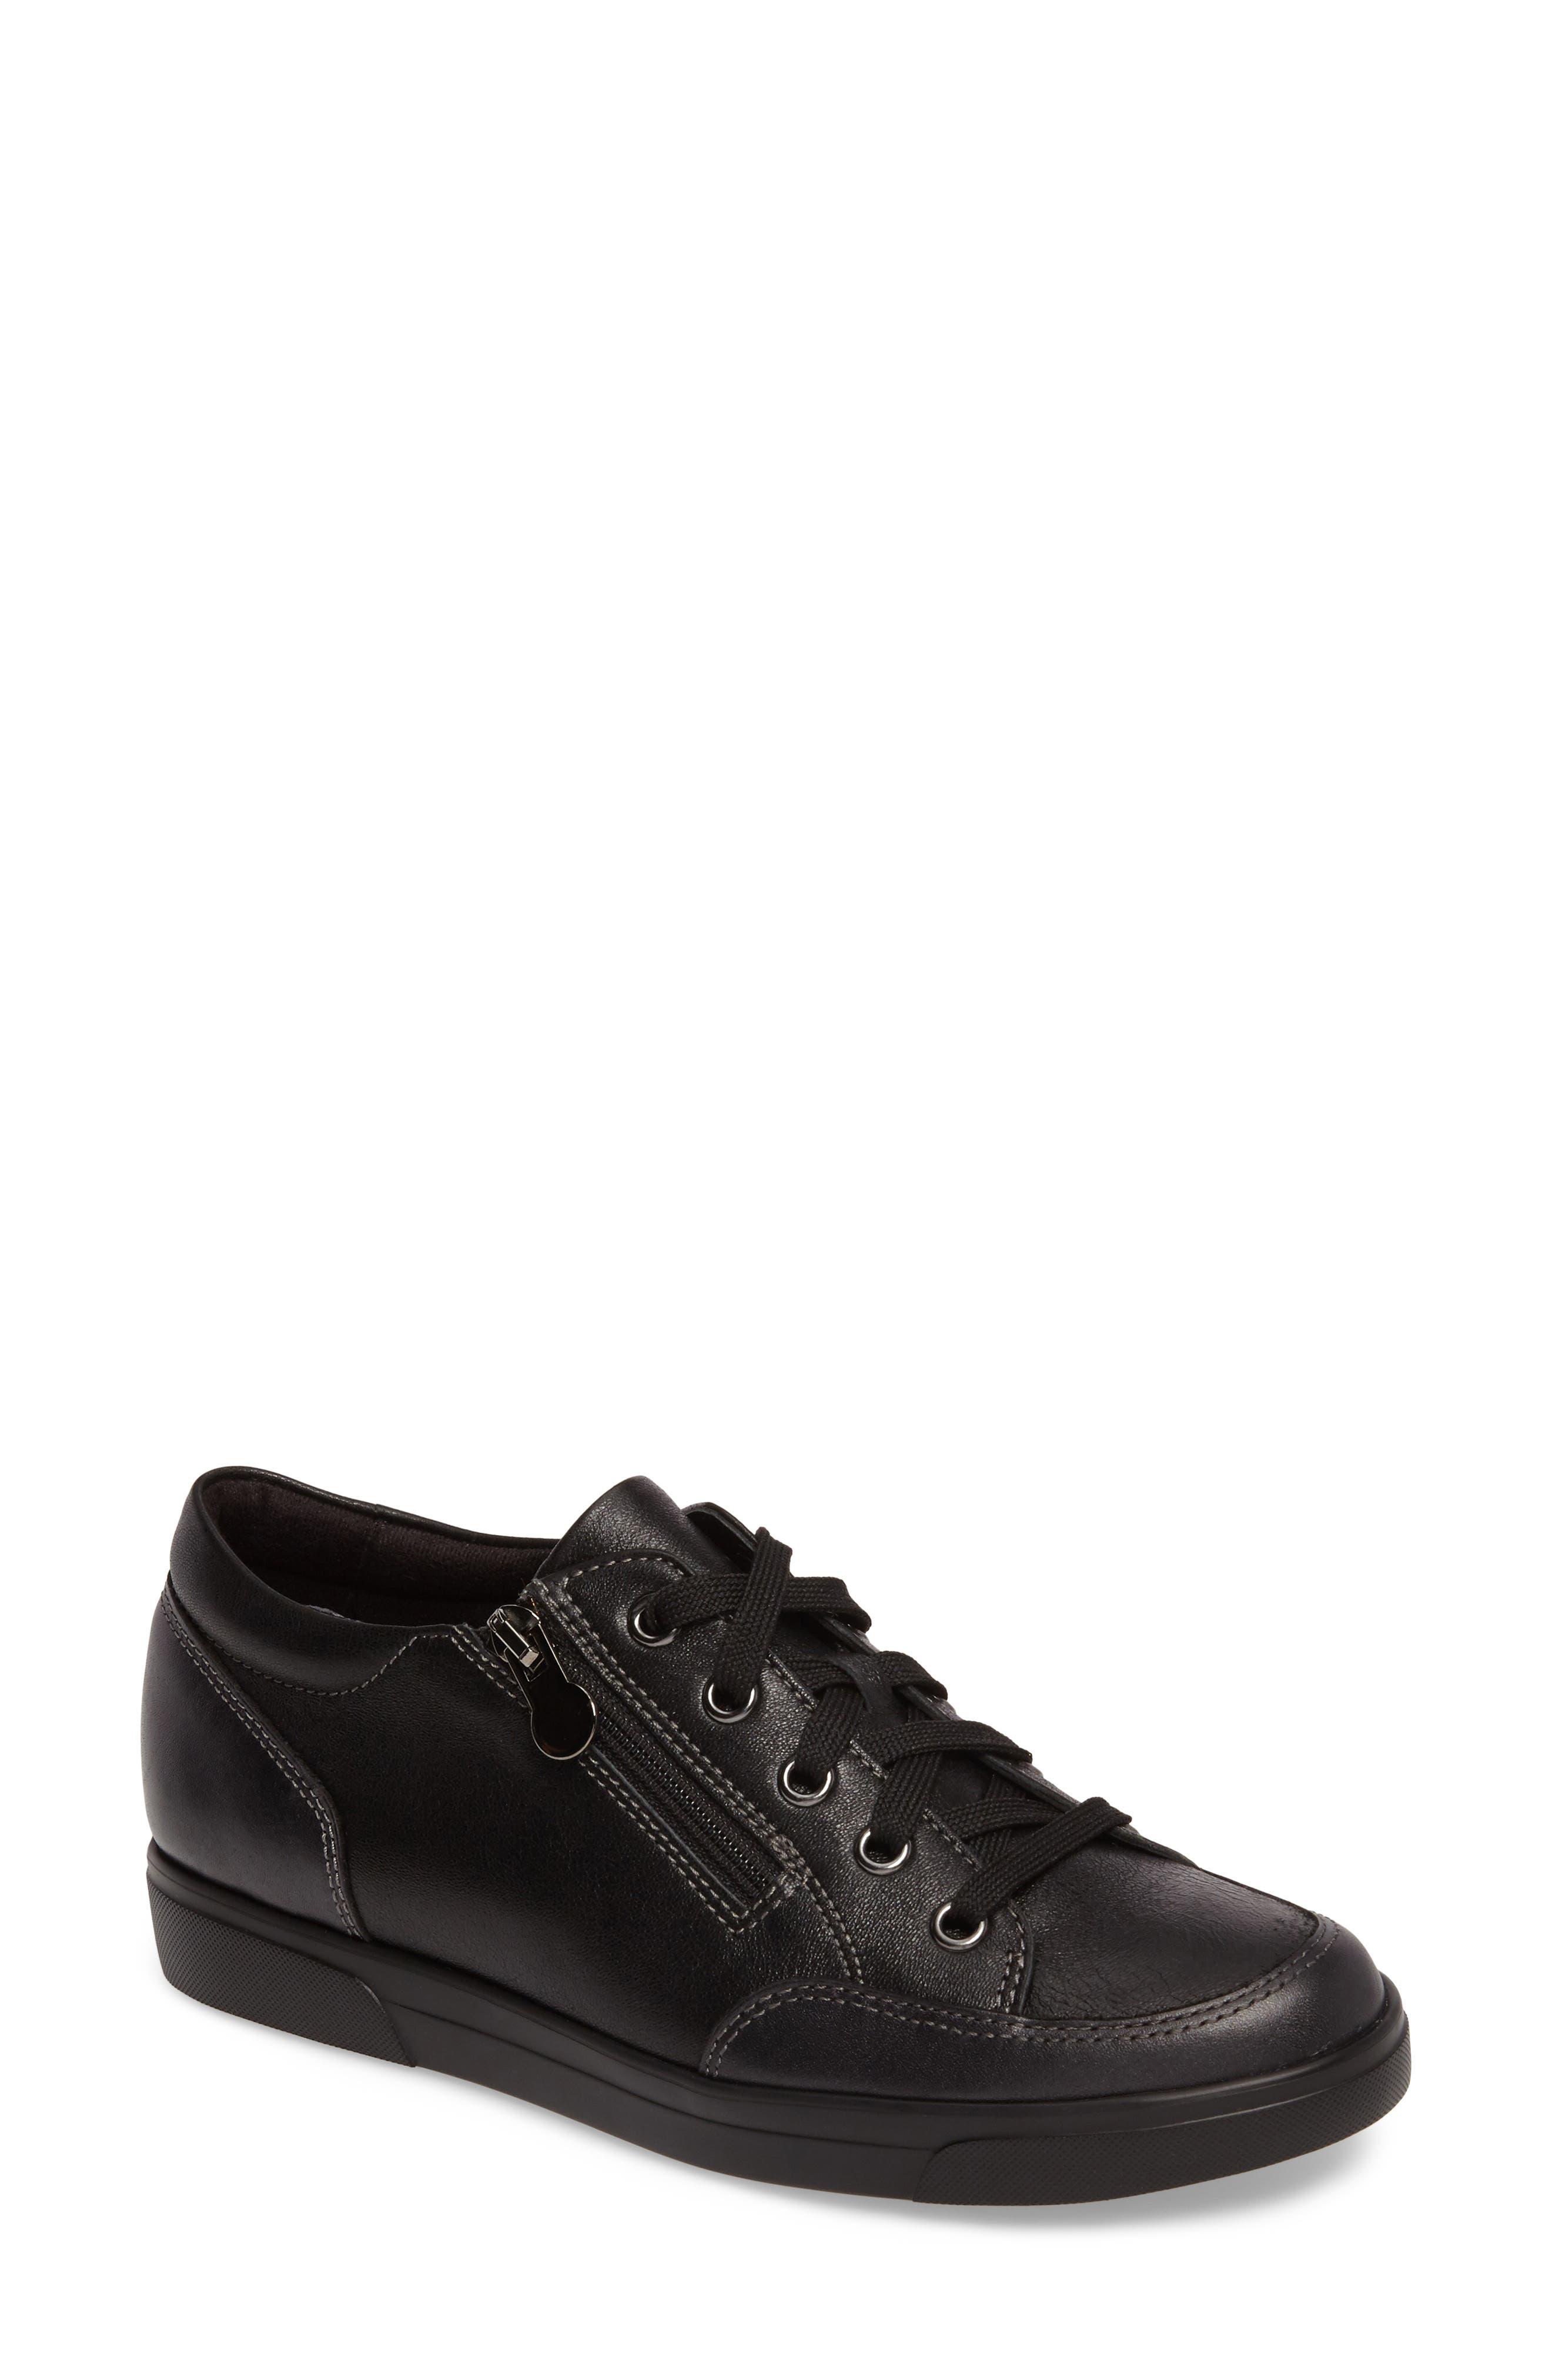 Main Image - Munro Gabbie Sneaker (Women)